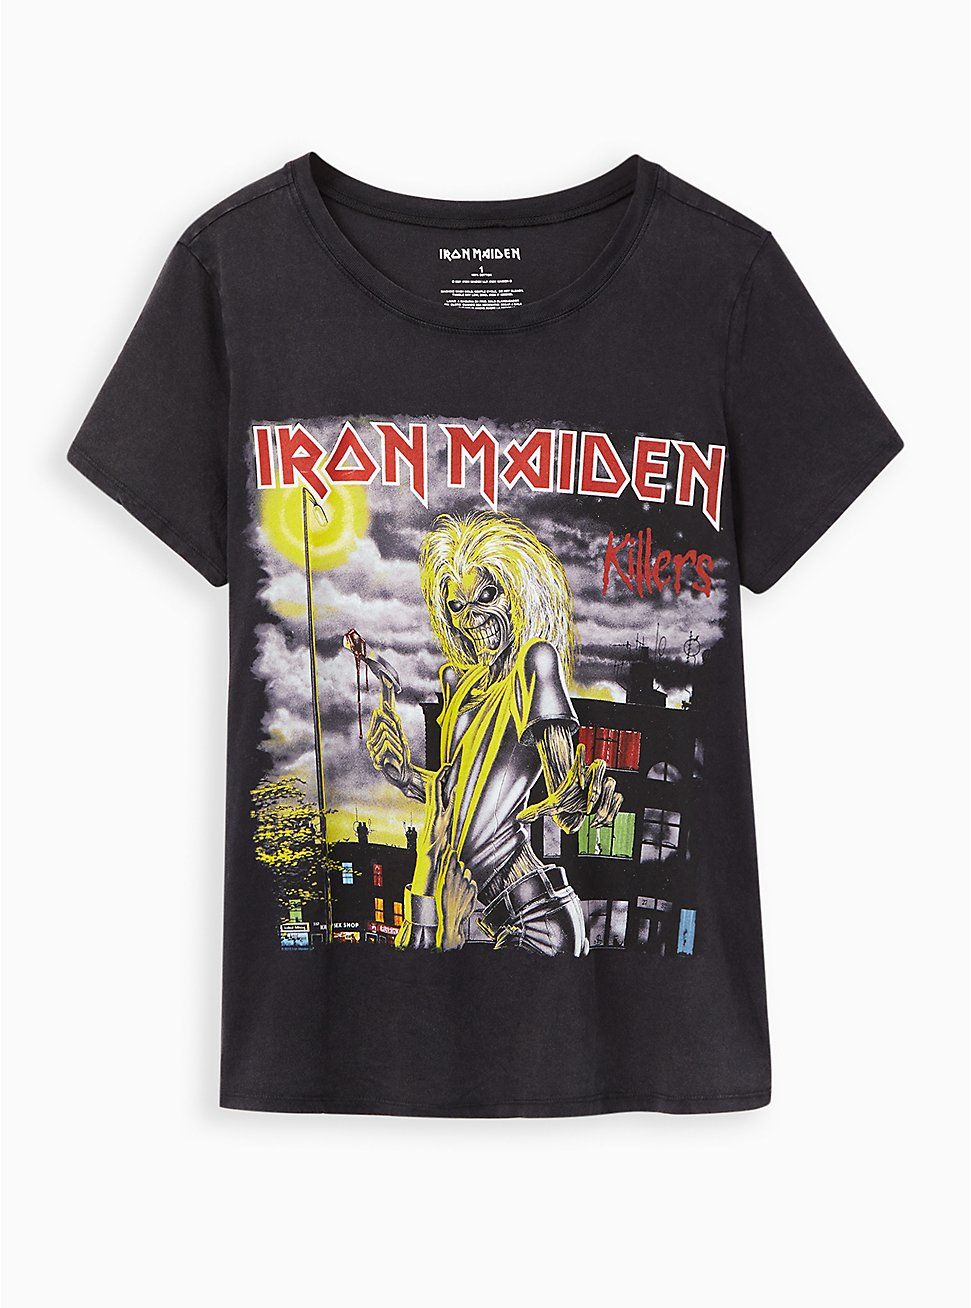 Classic Fit Crew Tee – Iron Maiden Mineral Wash Black, DEEP BLACK, hi-res